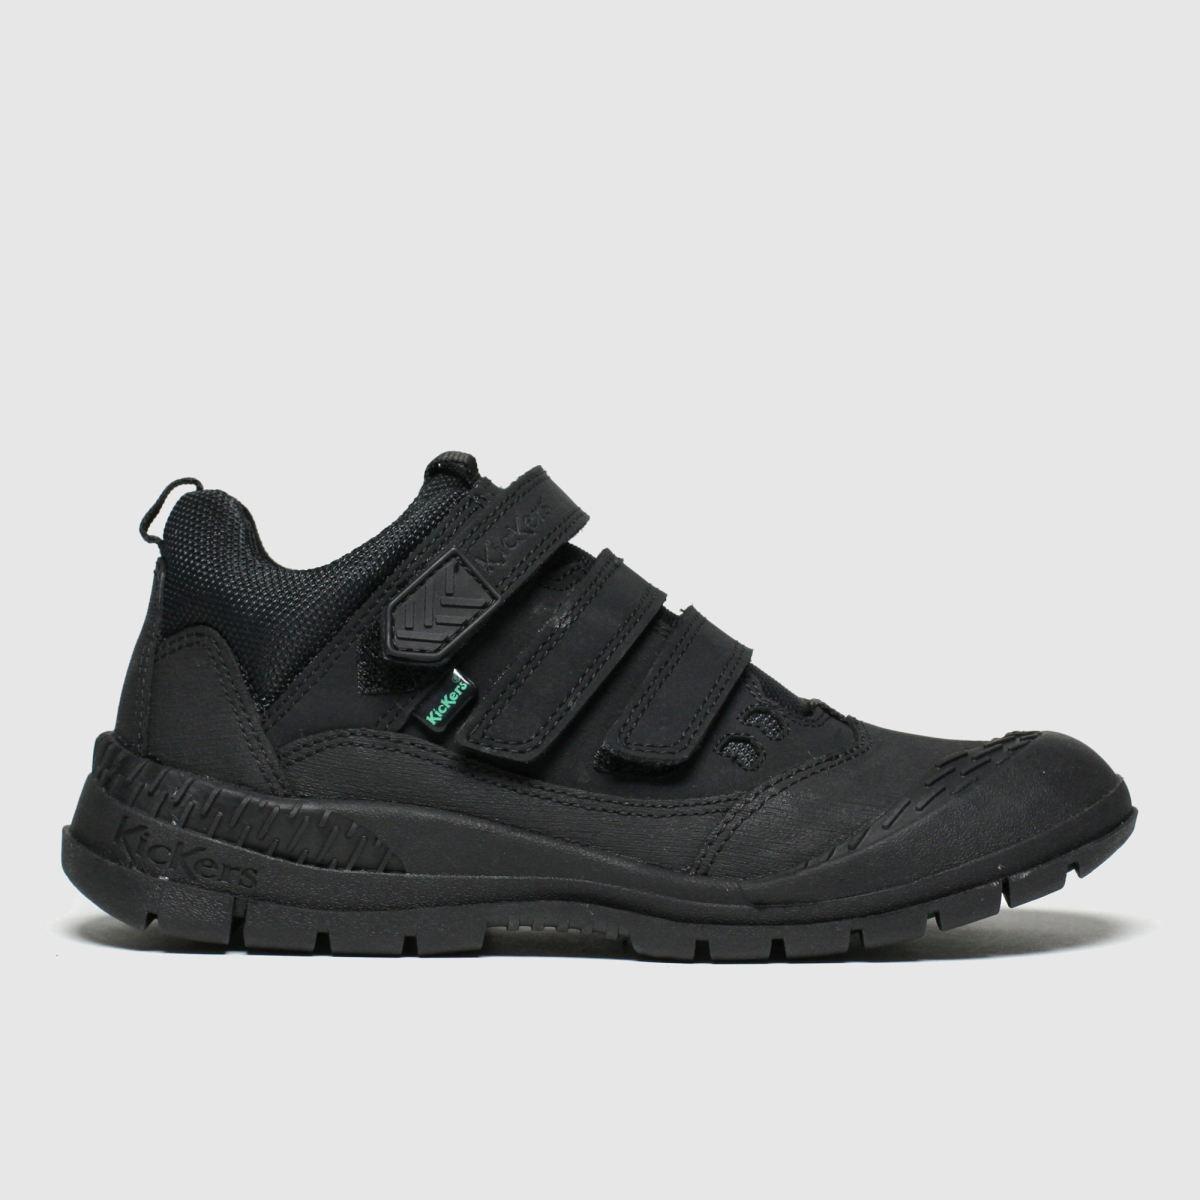 Kickers Kickers Black Kick Trukka Mid Shoes Junior